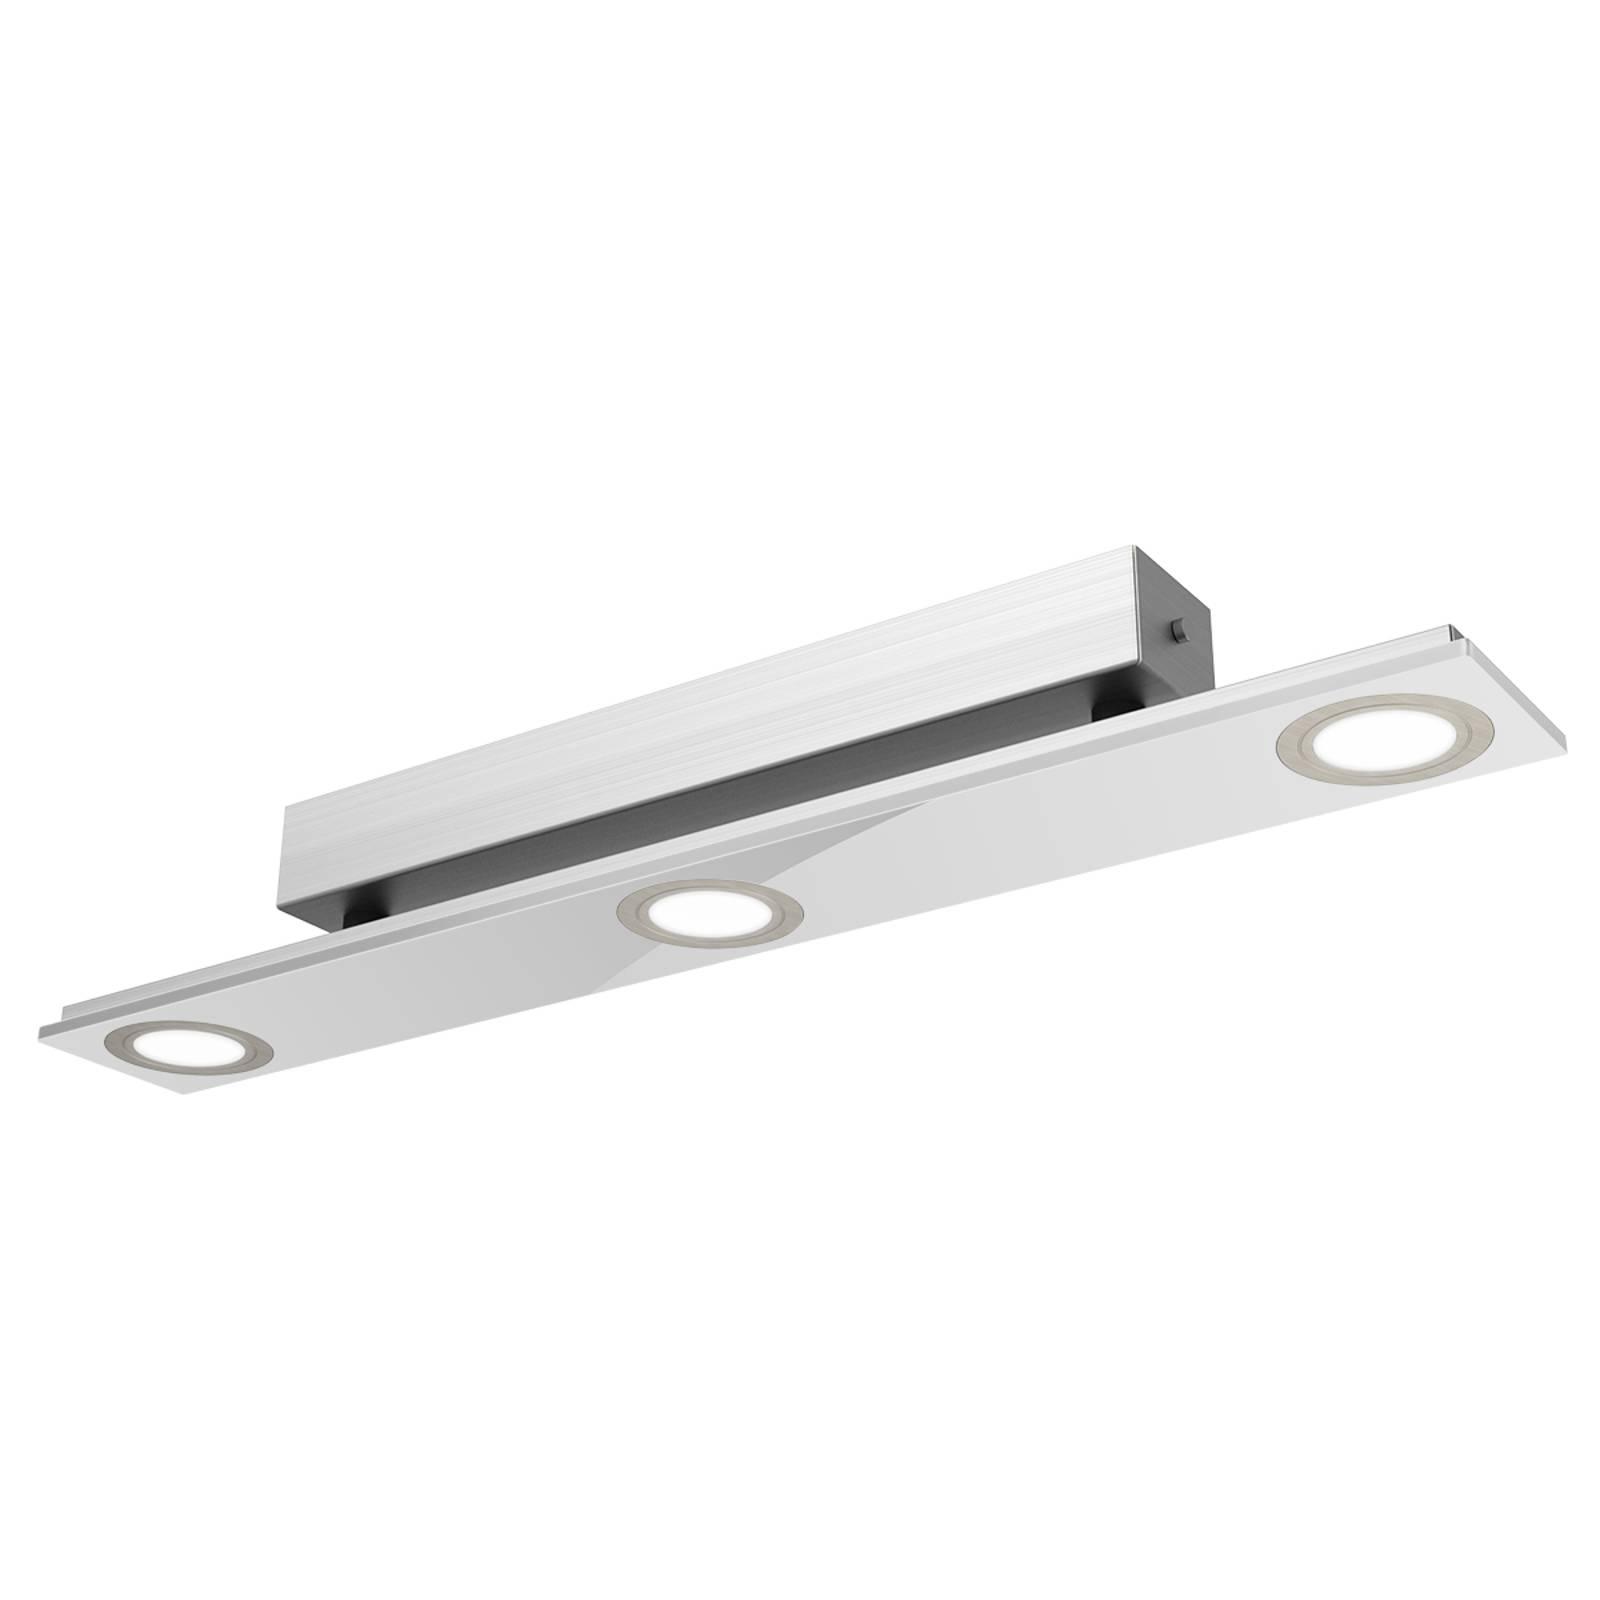 3-os. Pano-LED-kattovalaisin, metalli